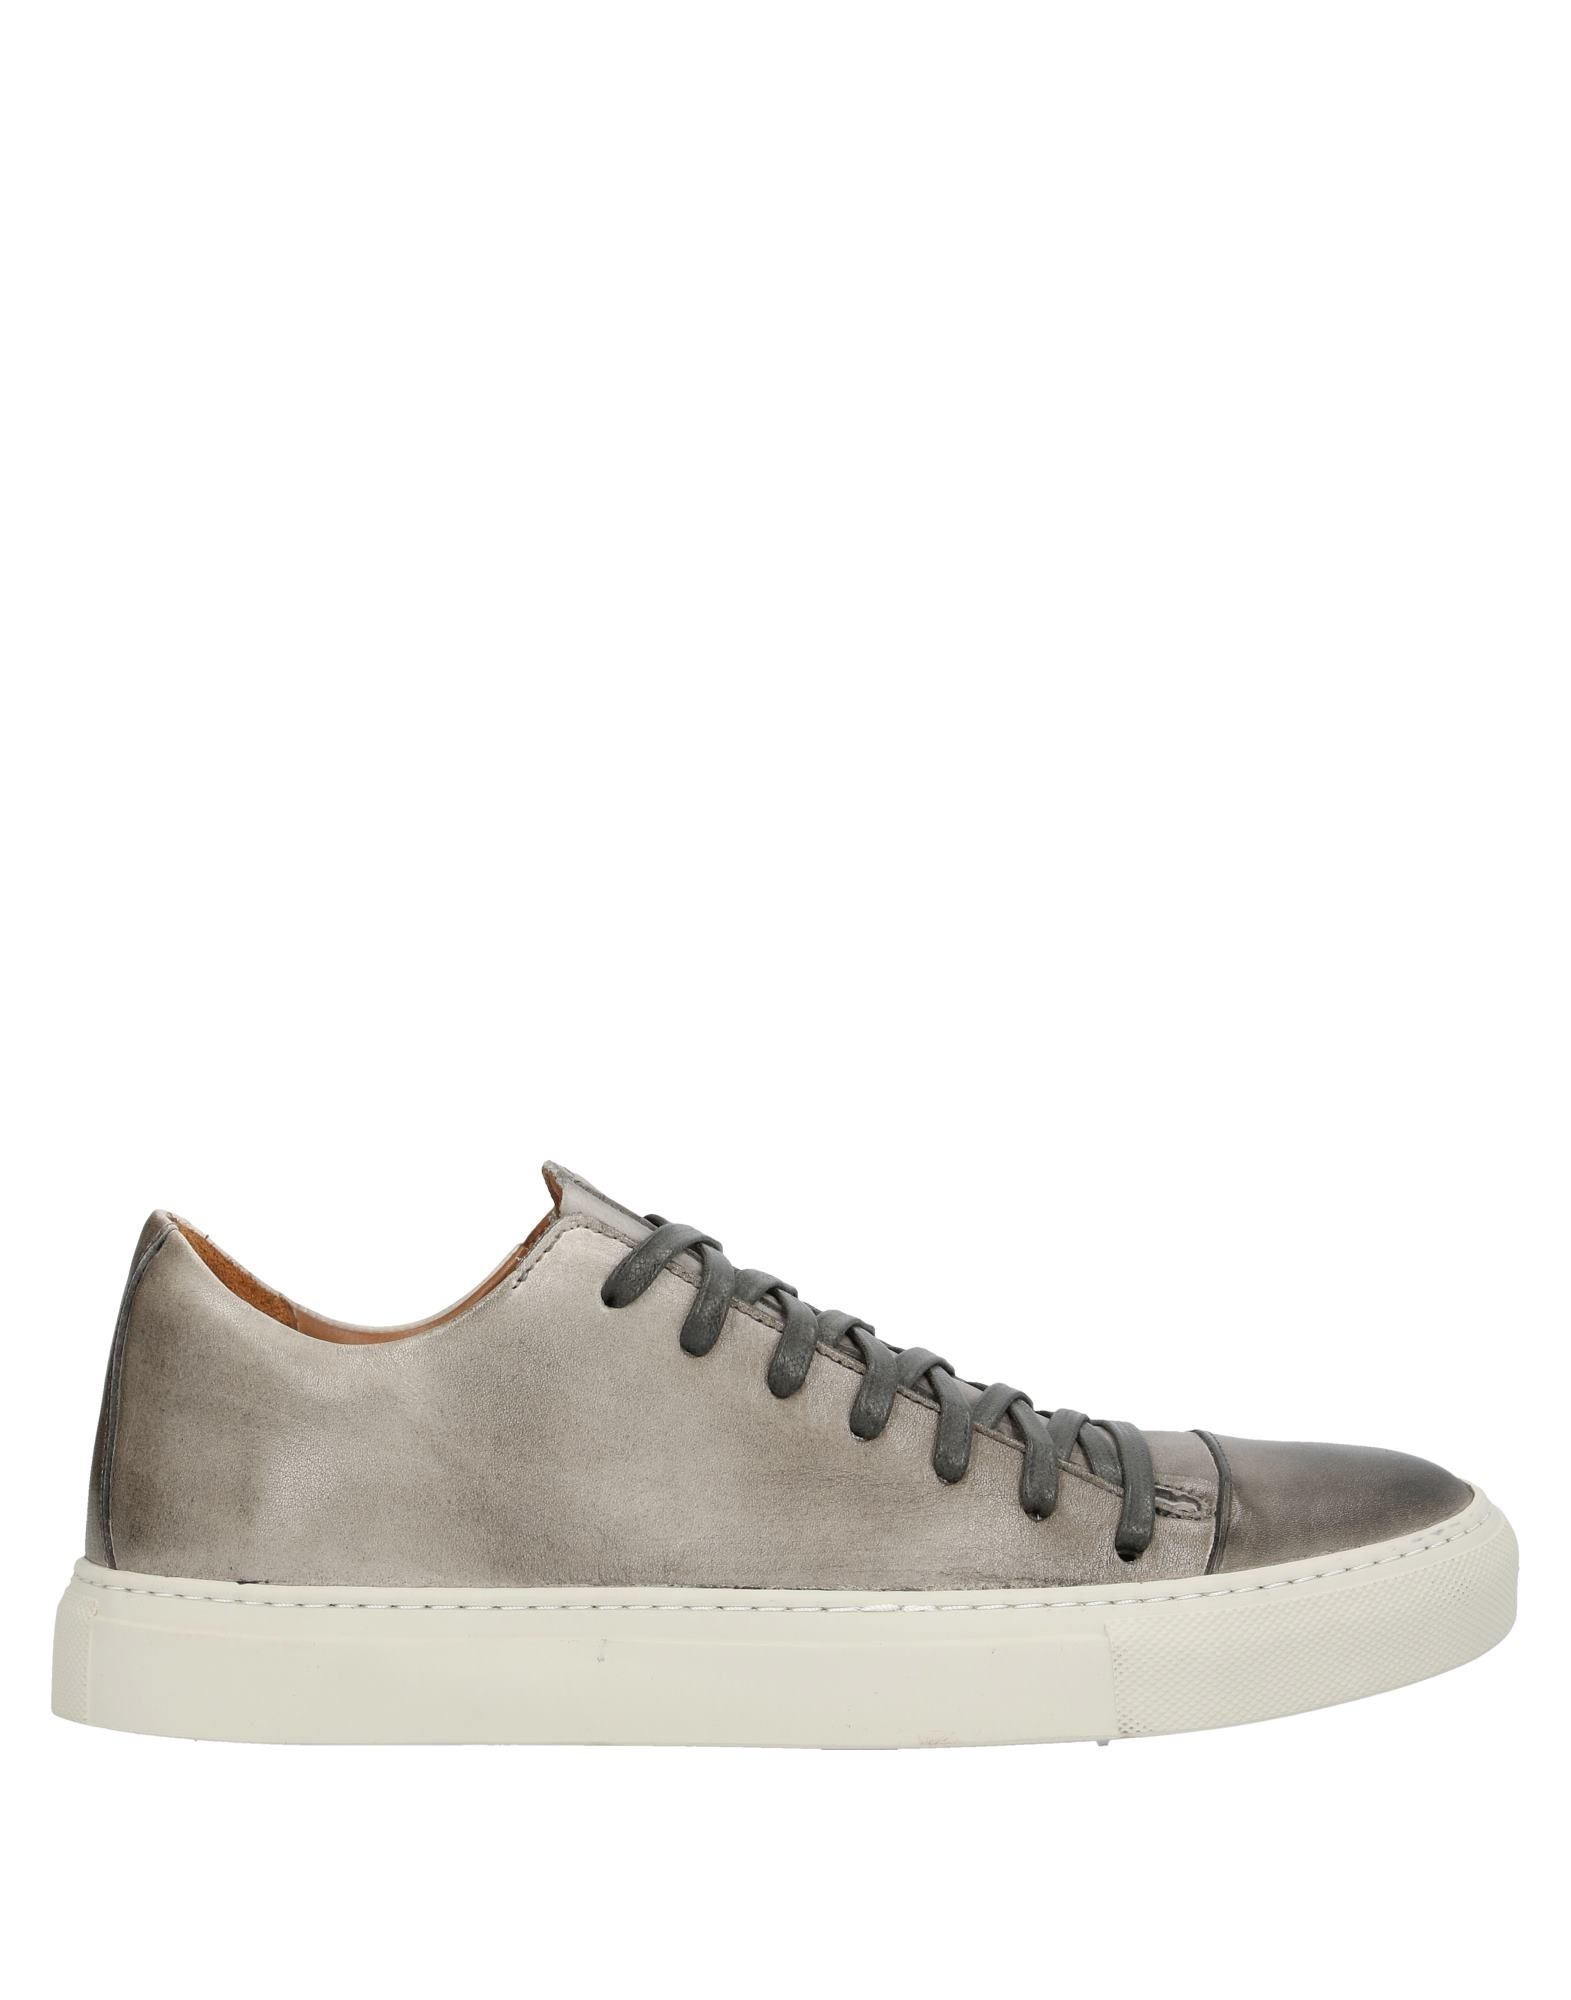 JOHN VARVATOS Low-tops & sneakers - Item 11840633